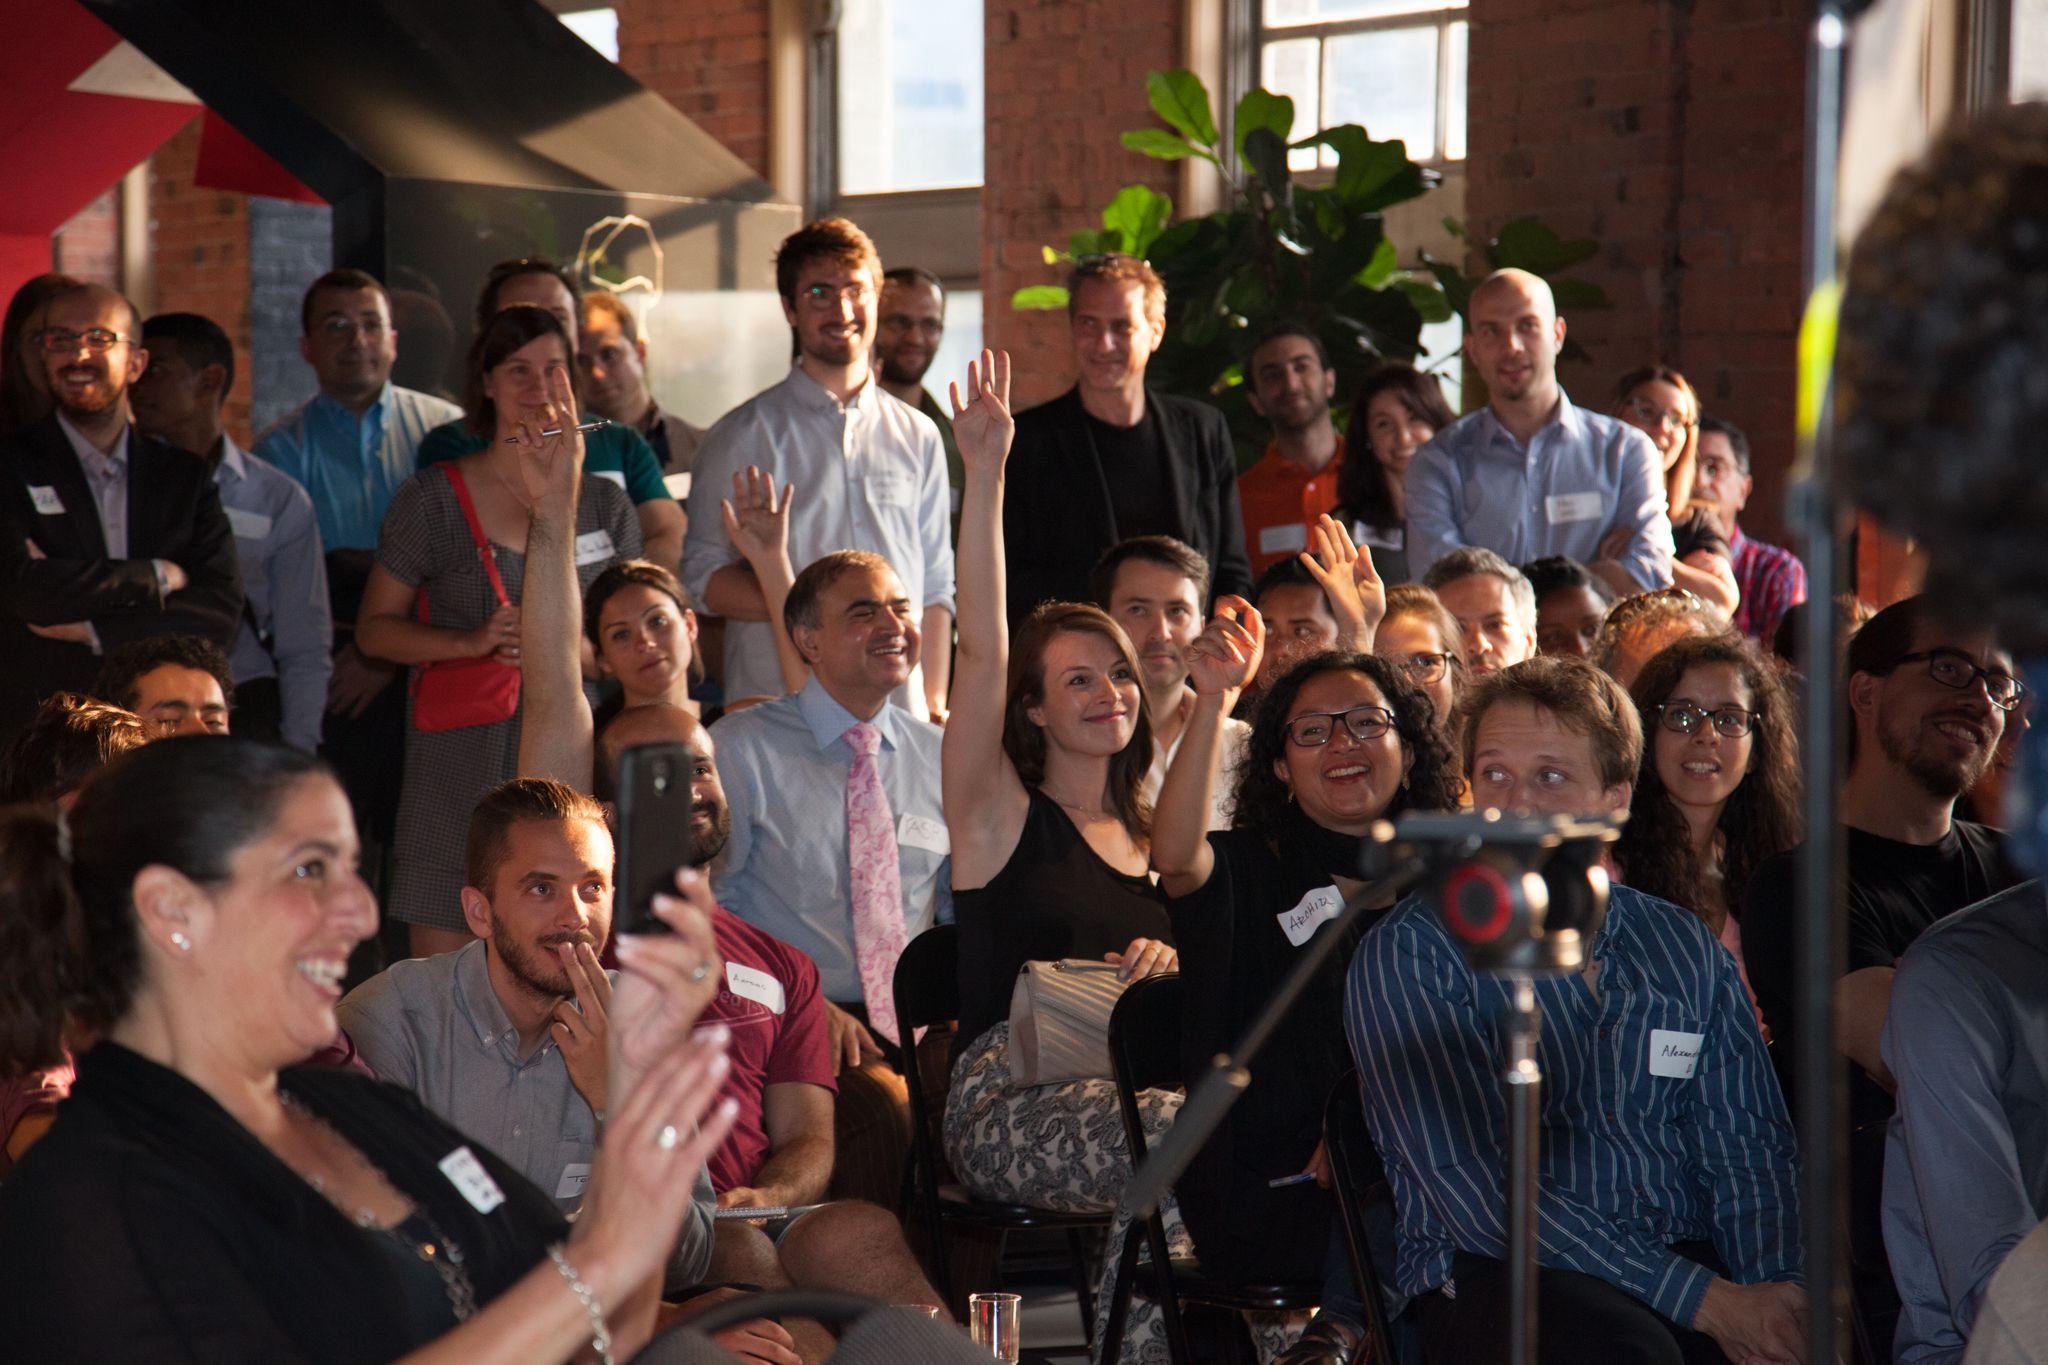 MTL NewTech - Montreal + Startups Community